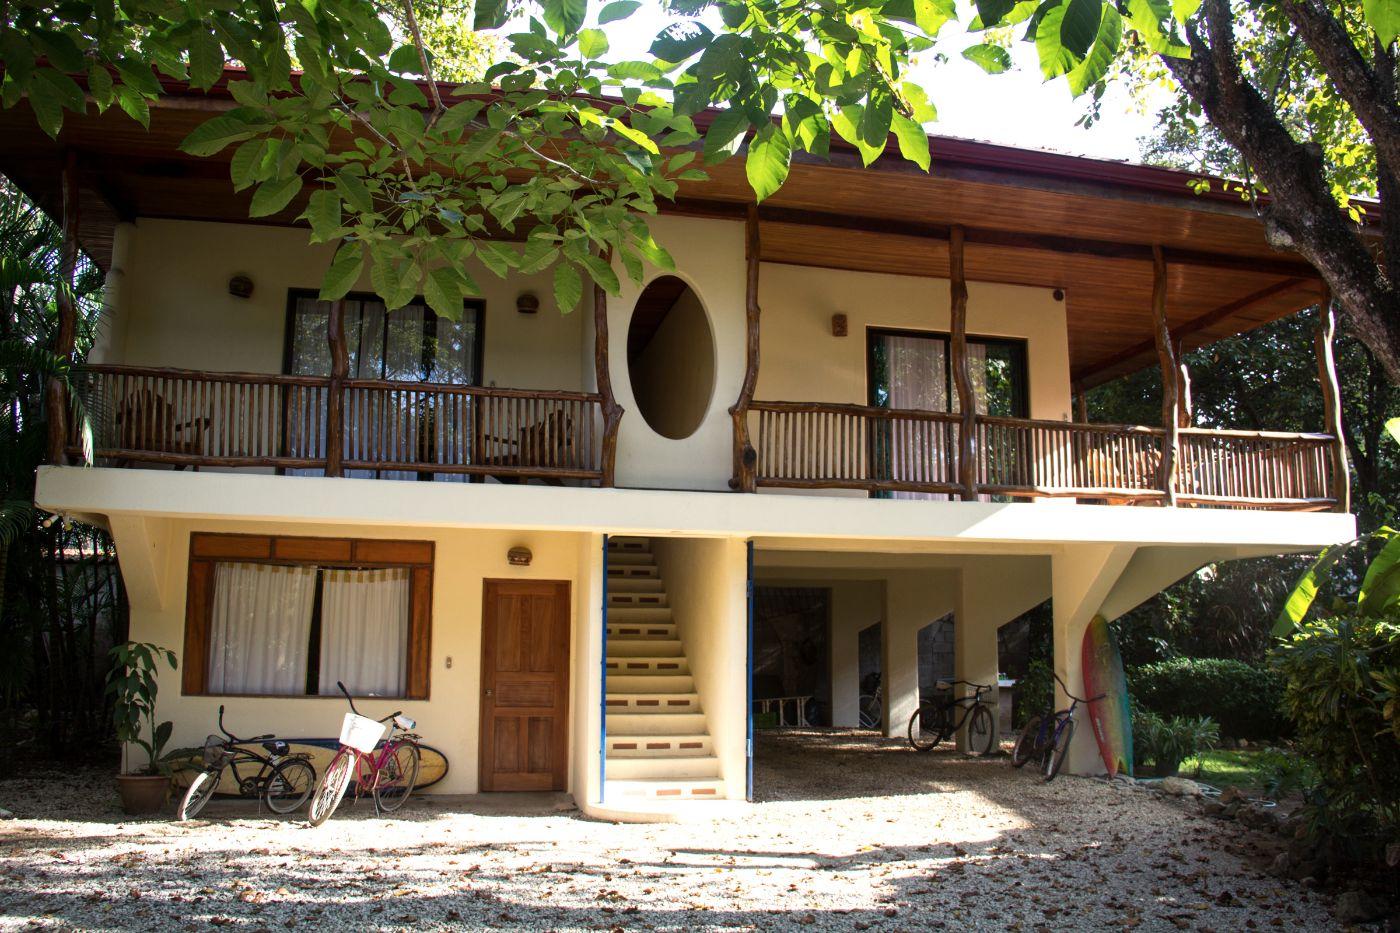 nosara-beach-house-1-of-1-1400x933.jpg